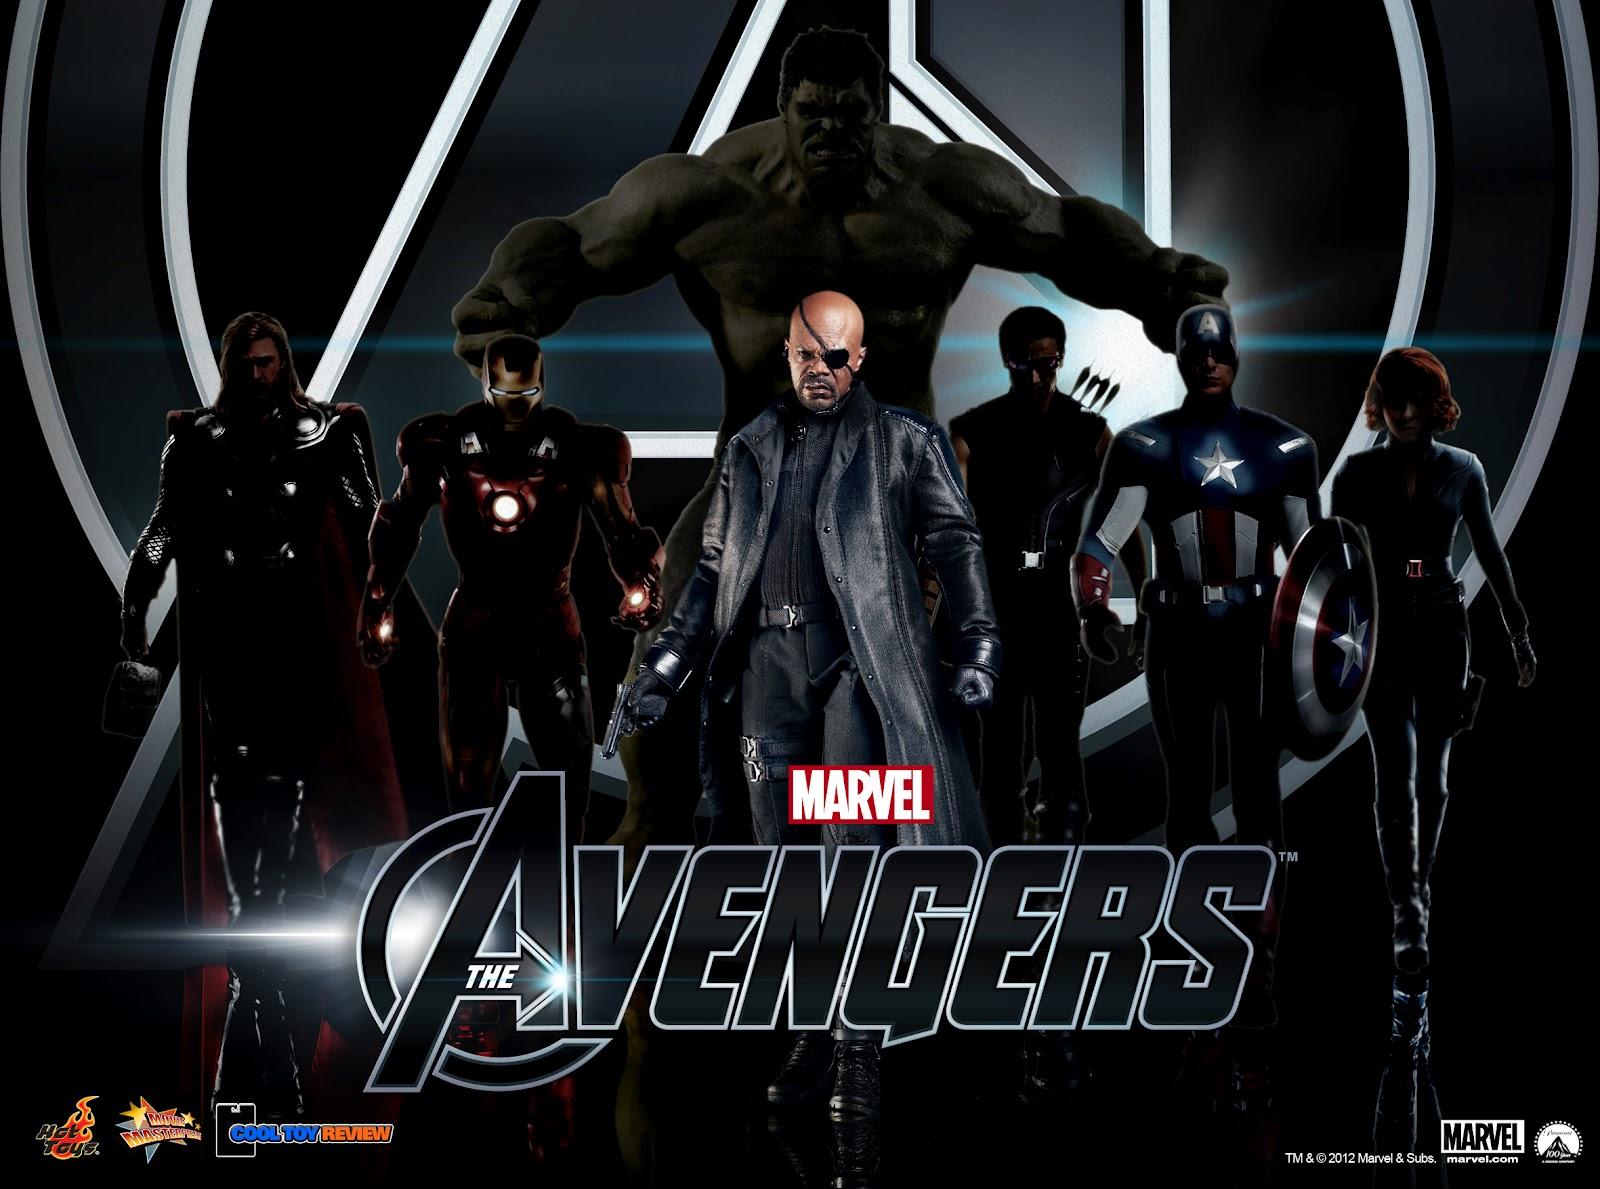 http://3.bp.blogspot.com/-ebbcG5Az0UA/T0PTCMpqXkI/AAAAAAAAB5I/IpUQfxfZe_0/s1600/Hot_Toys_Avengers_Teaser.jpg